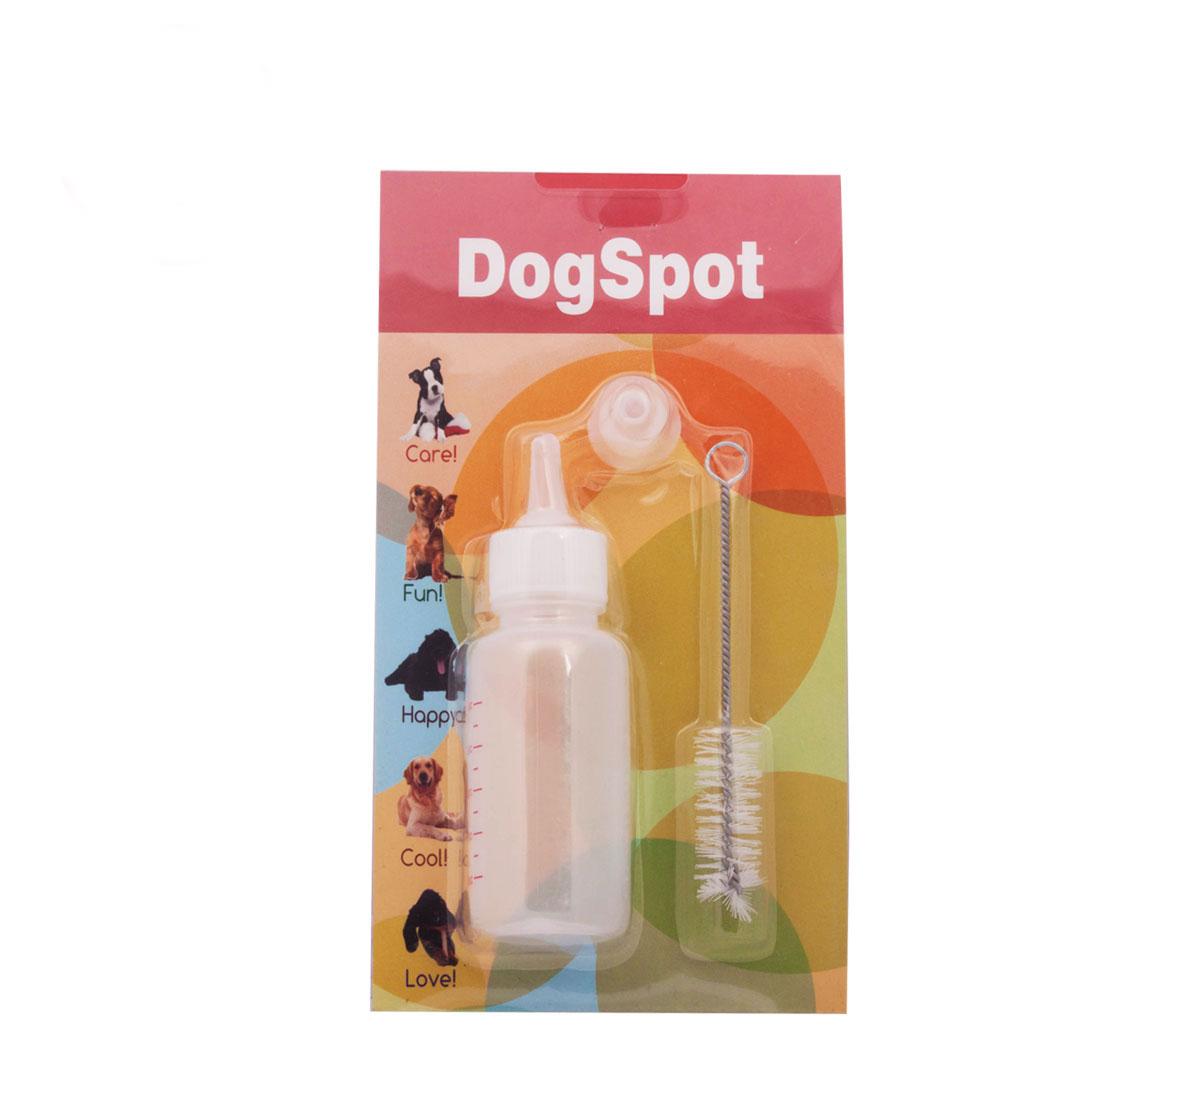 DogSpot Puppies Nursing Kit